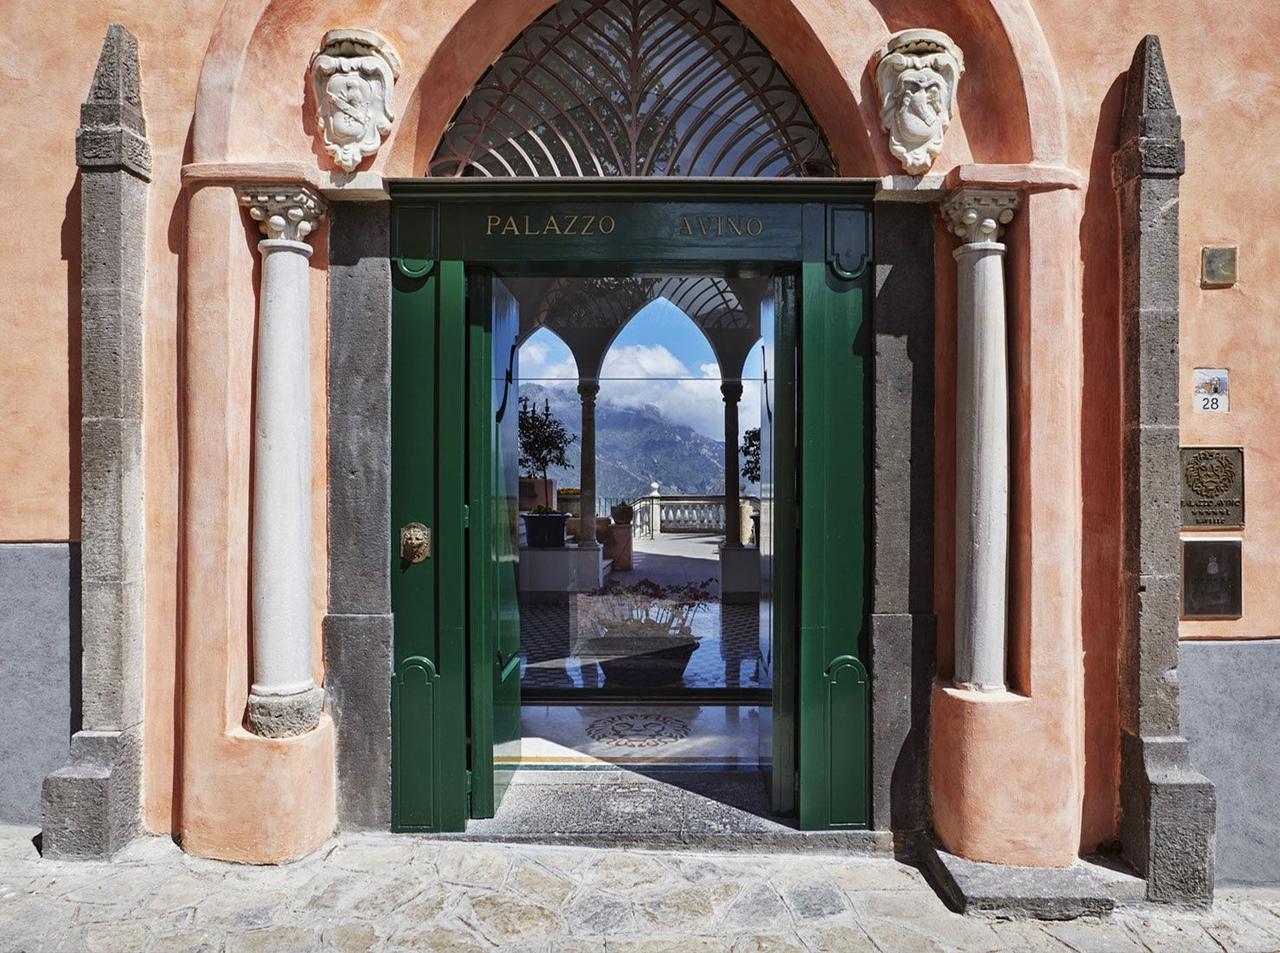 Кристина Челестино: отель Palazzo Avino в Равелло